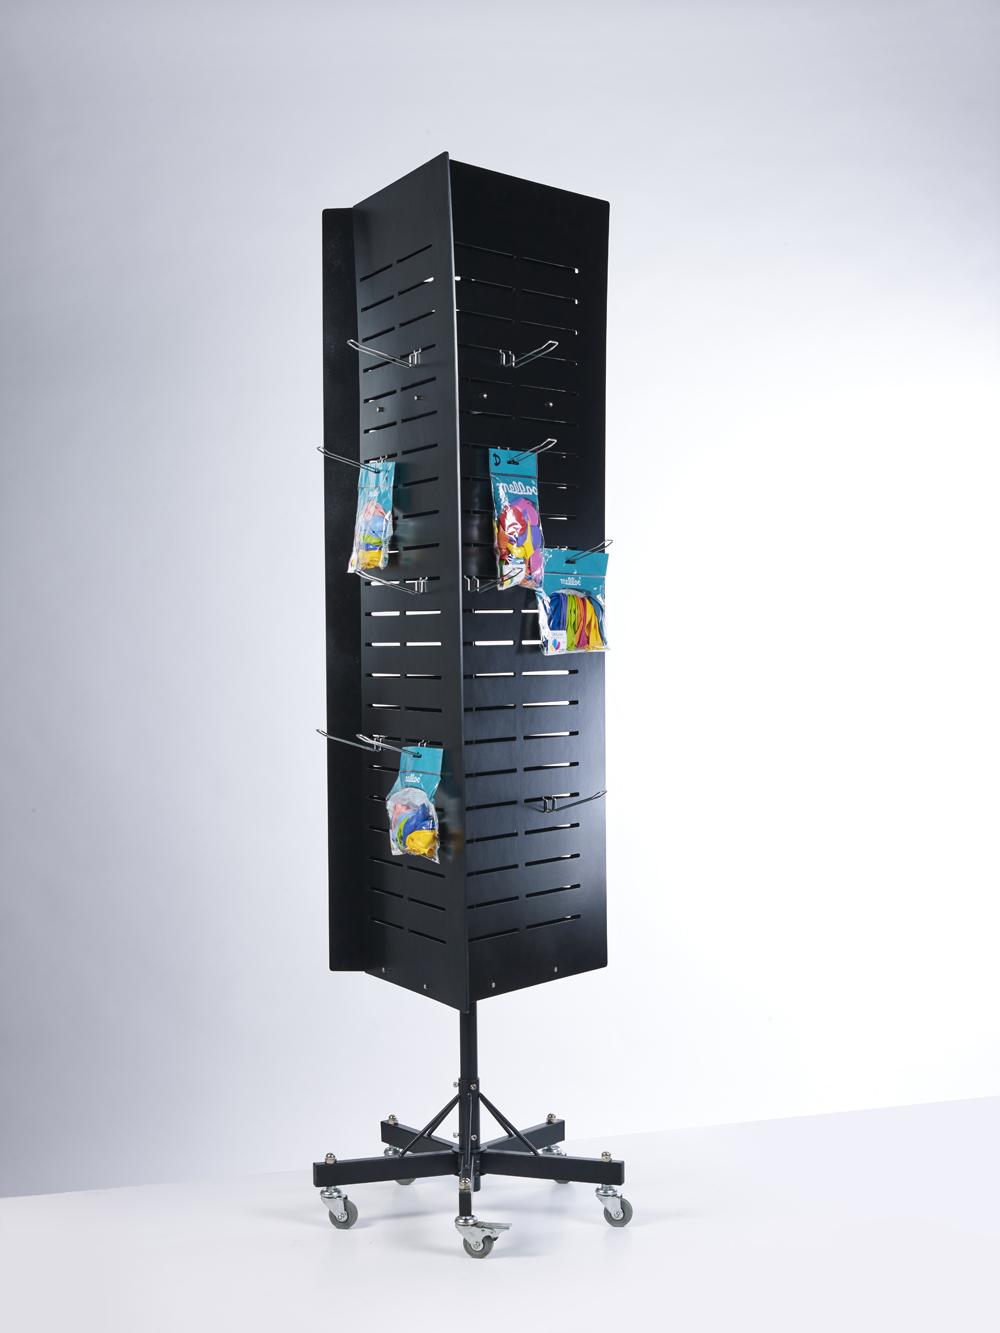 Holzdisplay für Haken - buyck displays - PW0850